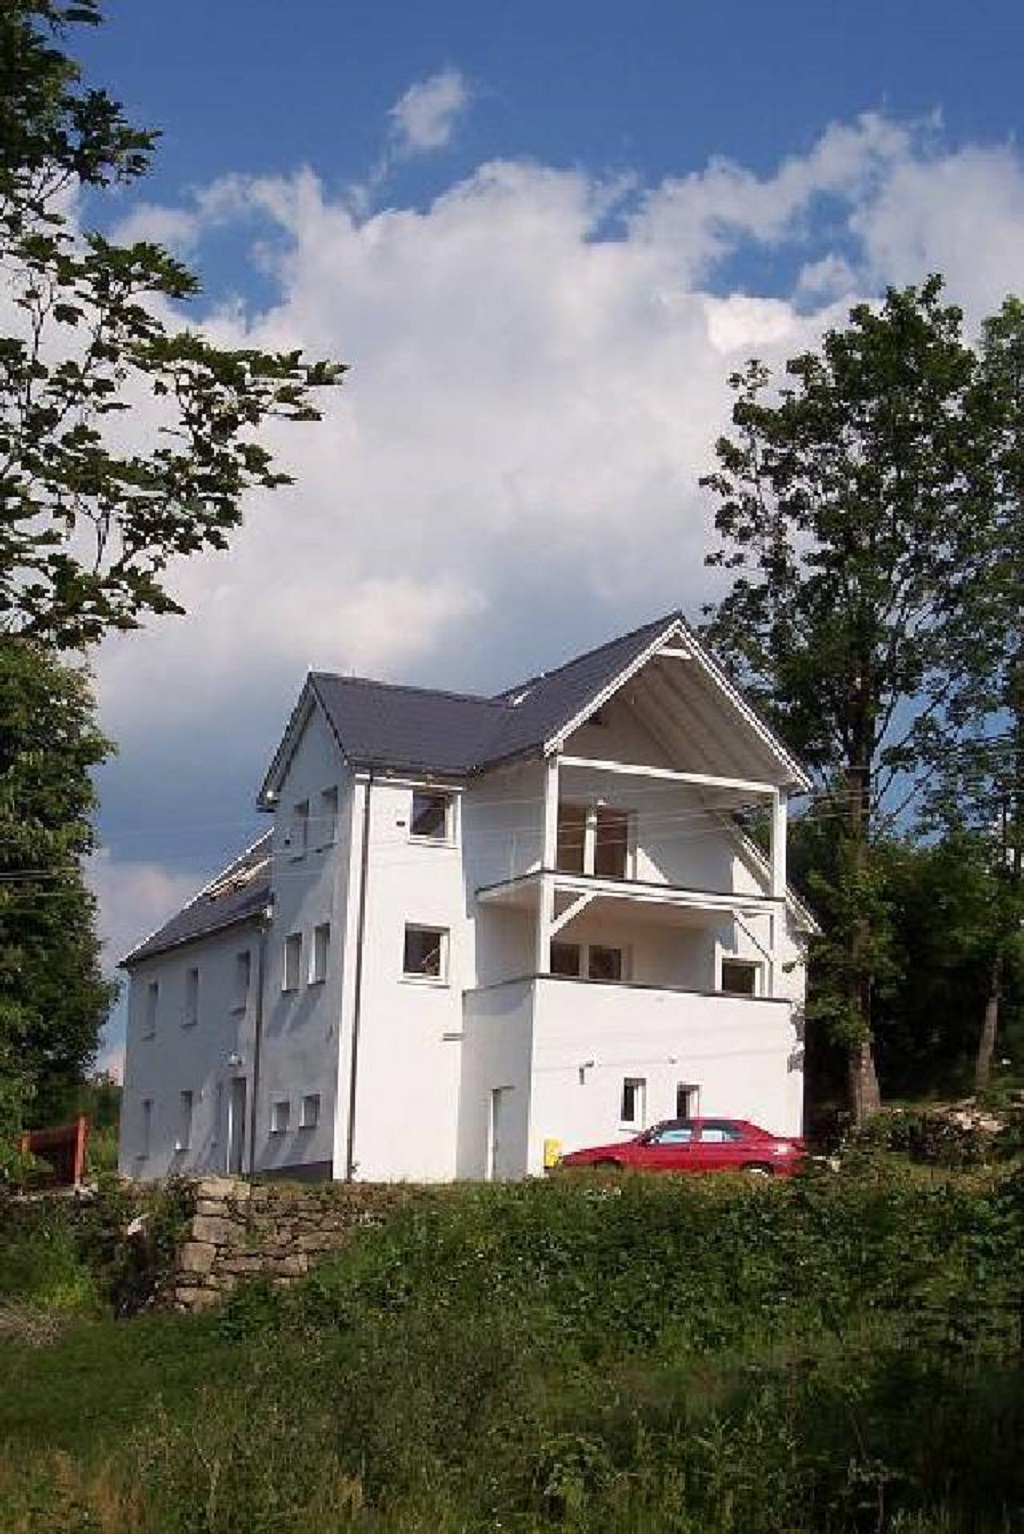 Villa Villa Panorama Swieradow Zdroj-Bad Flinsberg 1